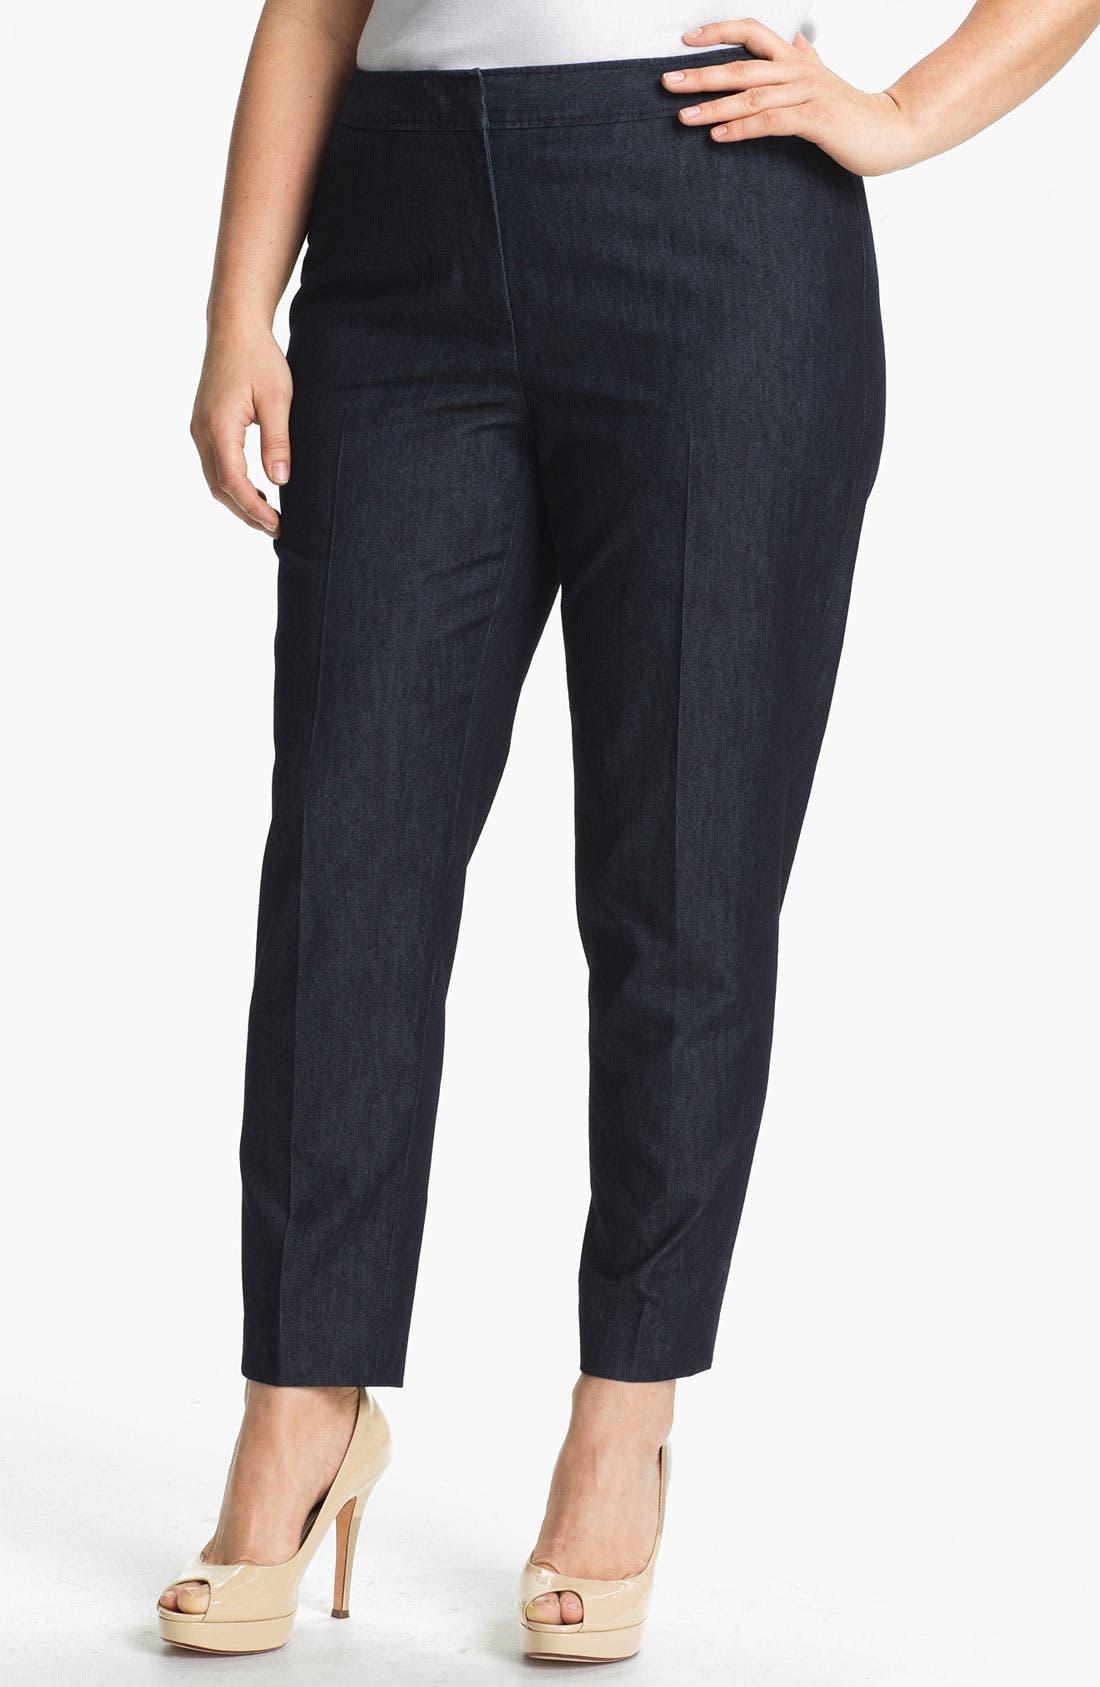 Alternate Image 1 Selected - Sejour Stretch Cotton Ankle Pants (Plus Size)